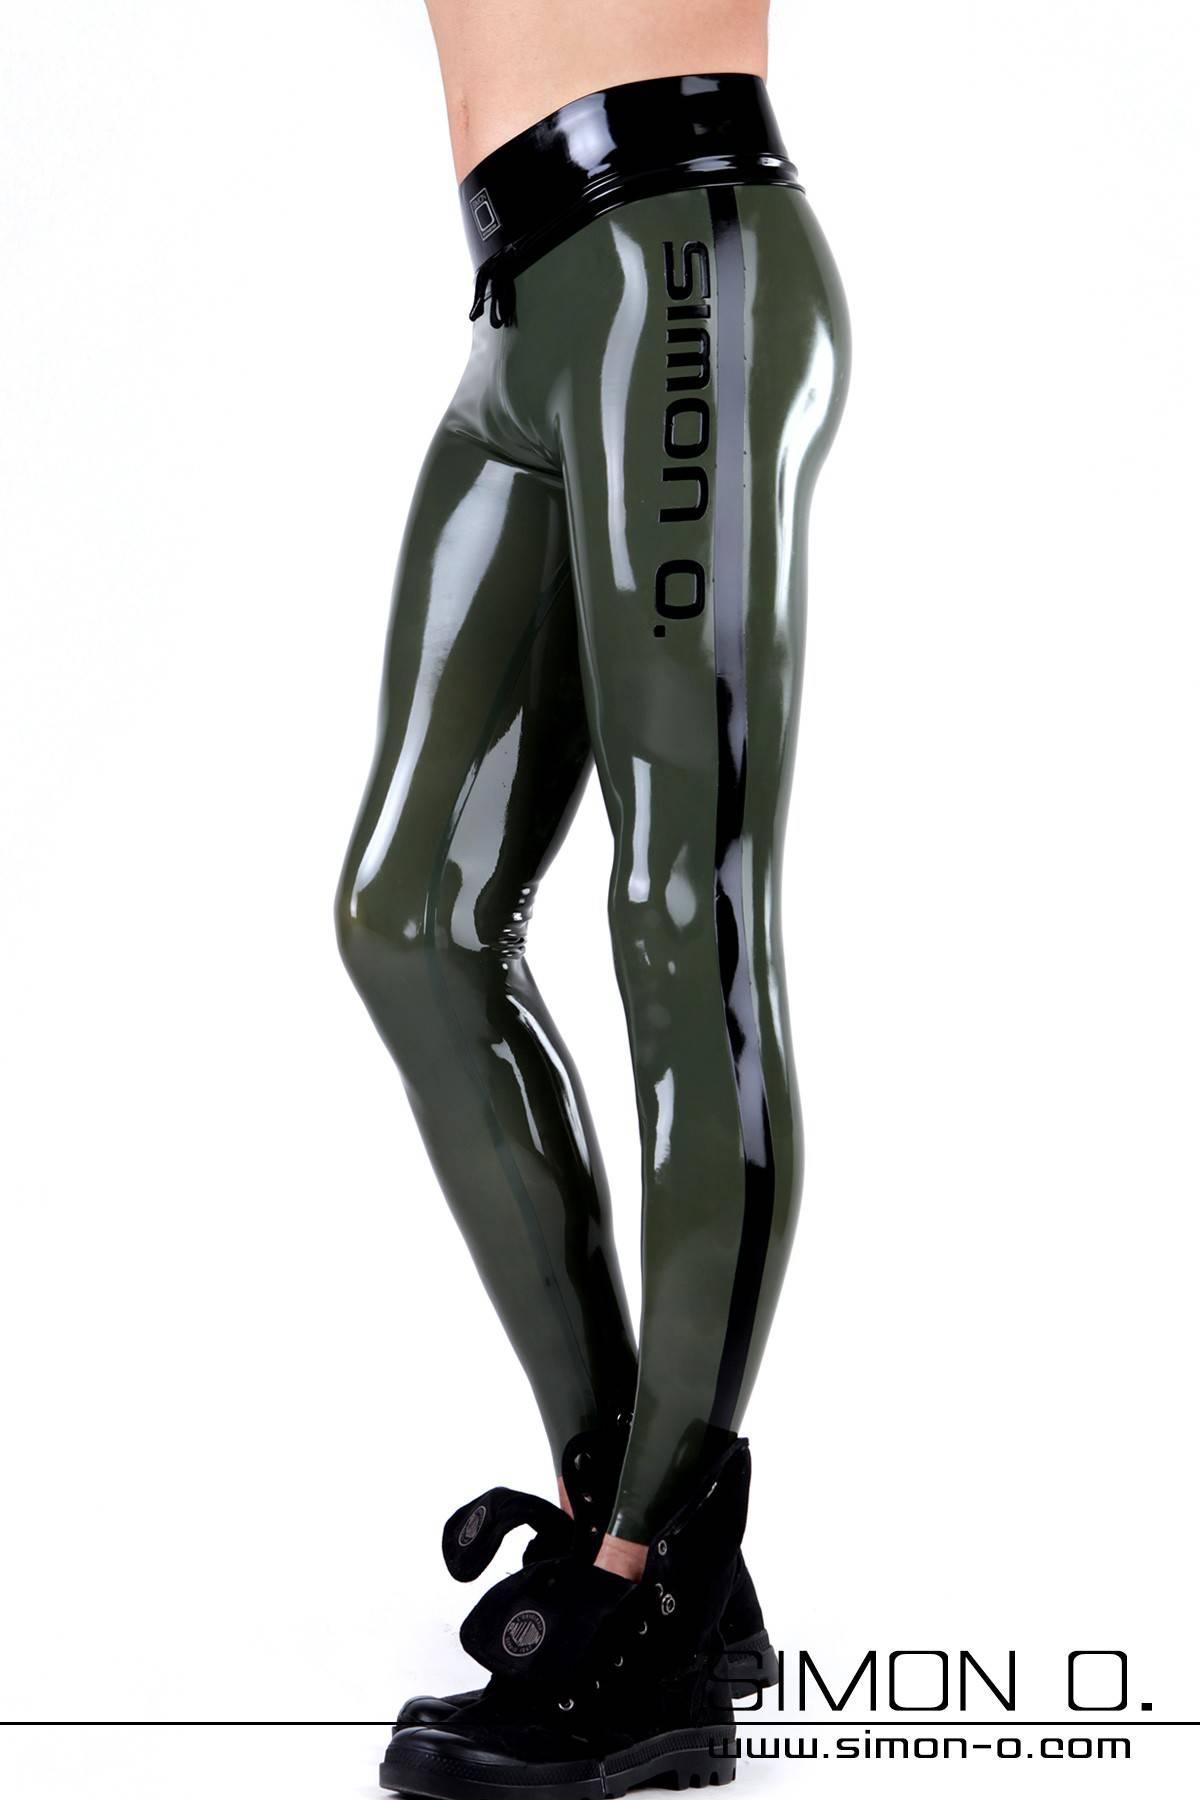 Latex Streetwear Leggings Herren Der hautenge Schnitt schmiegt sich perfekt an Hüfte und Beine - mit diesen Latex Streetwear Leggings kannst Du das …